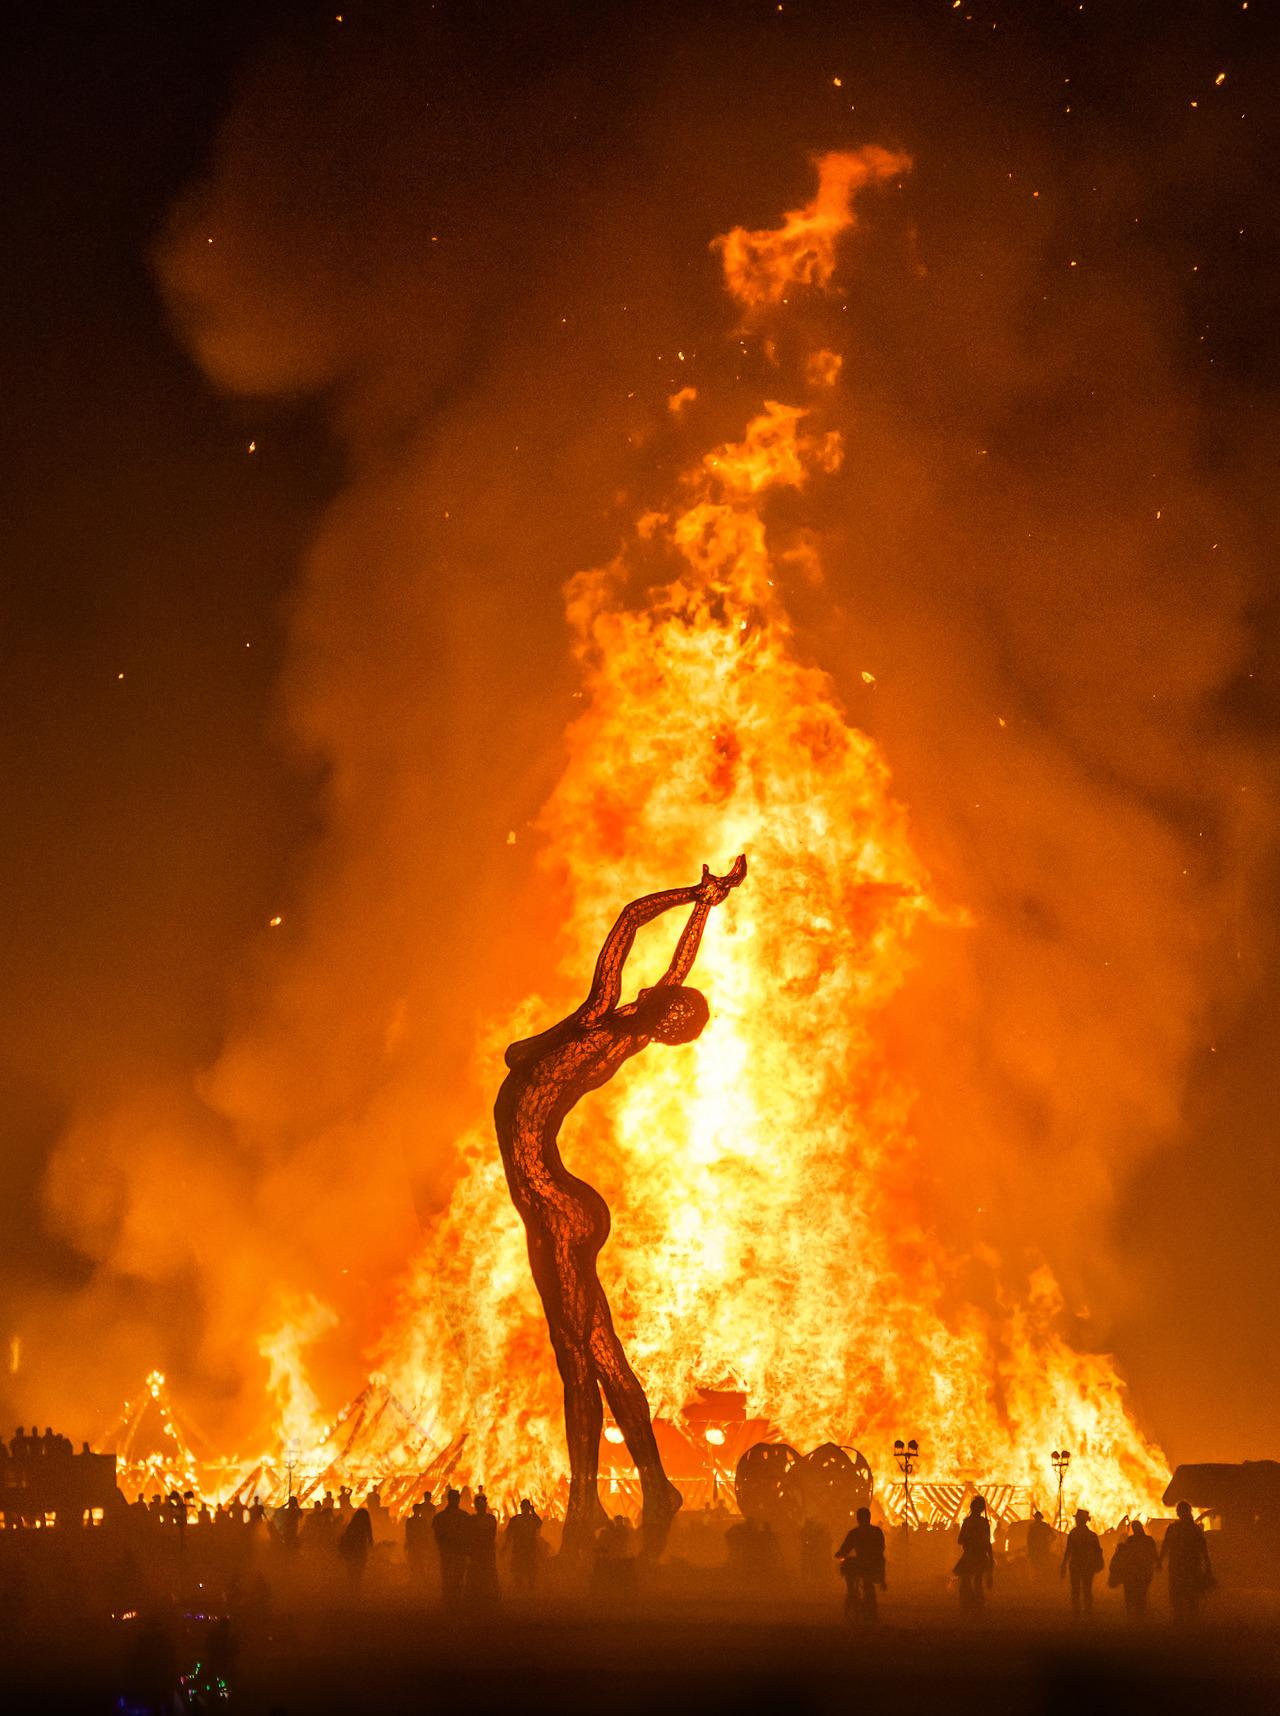 photo by Trey Ratcliff